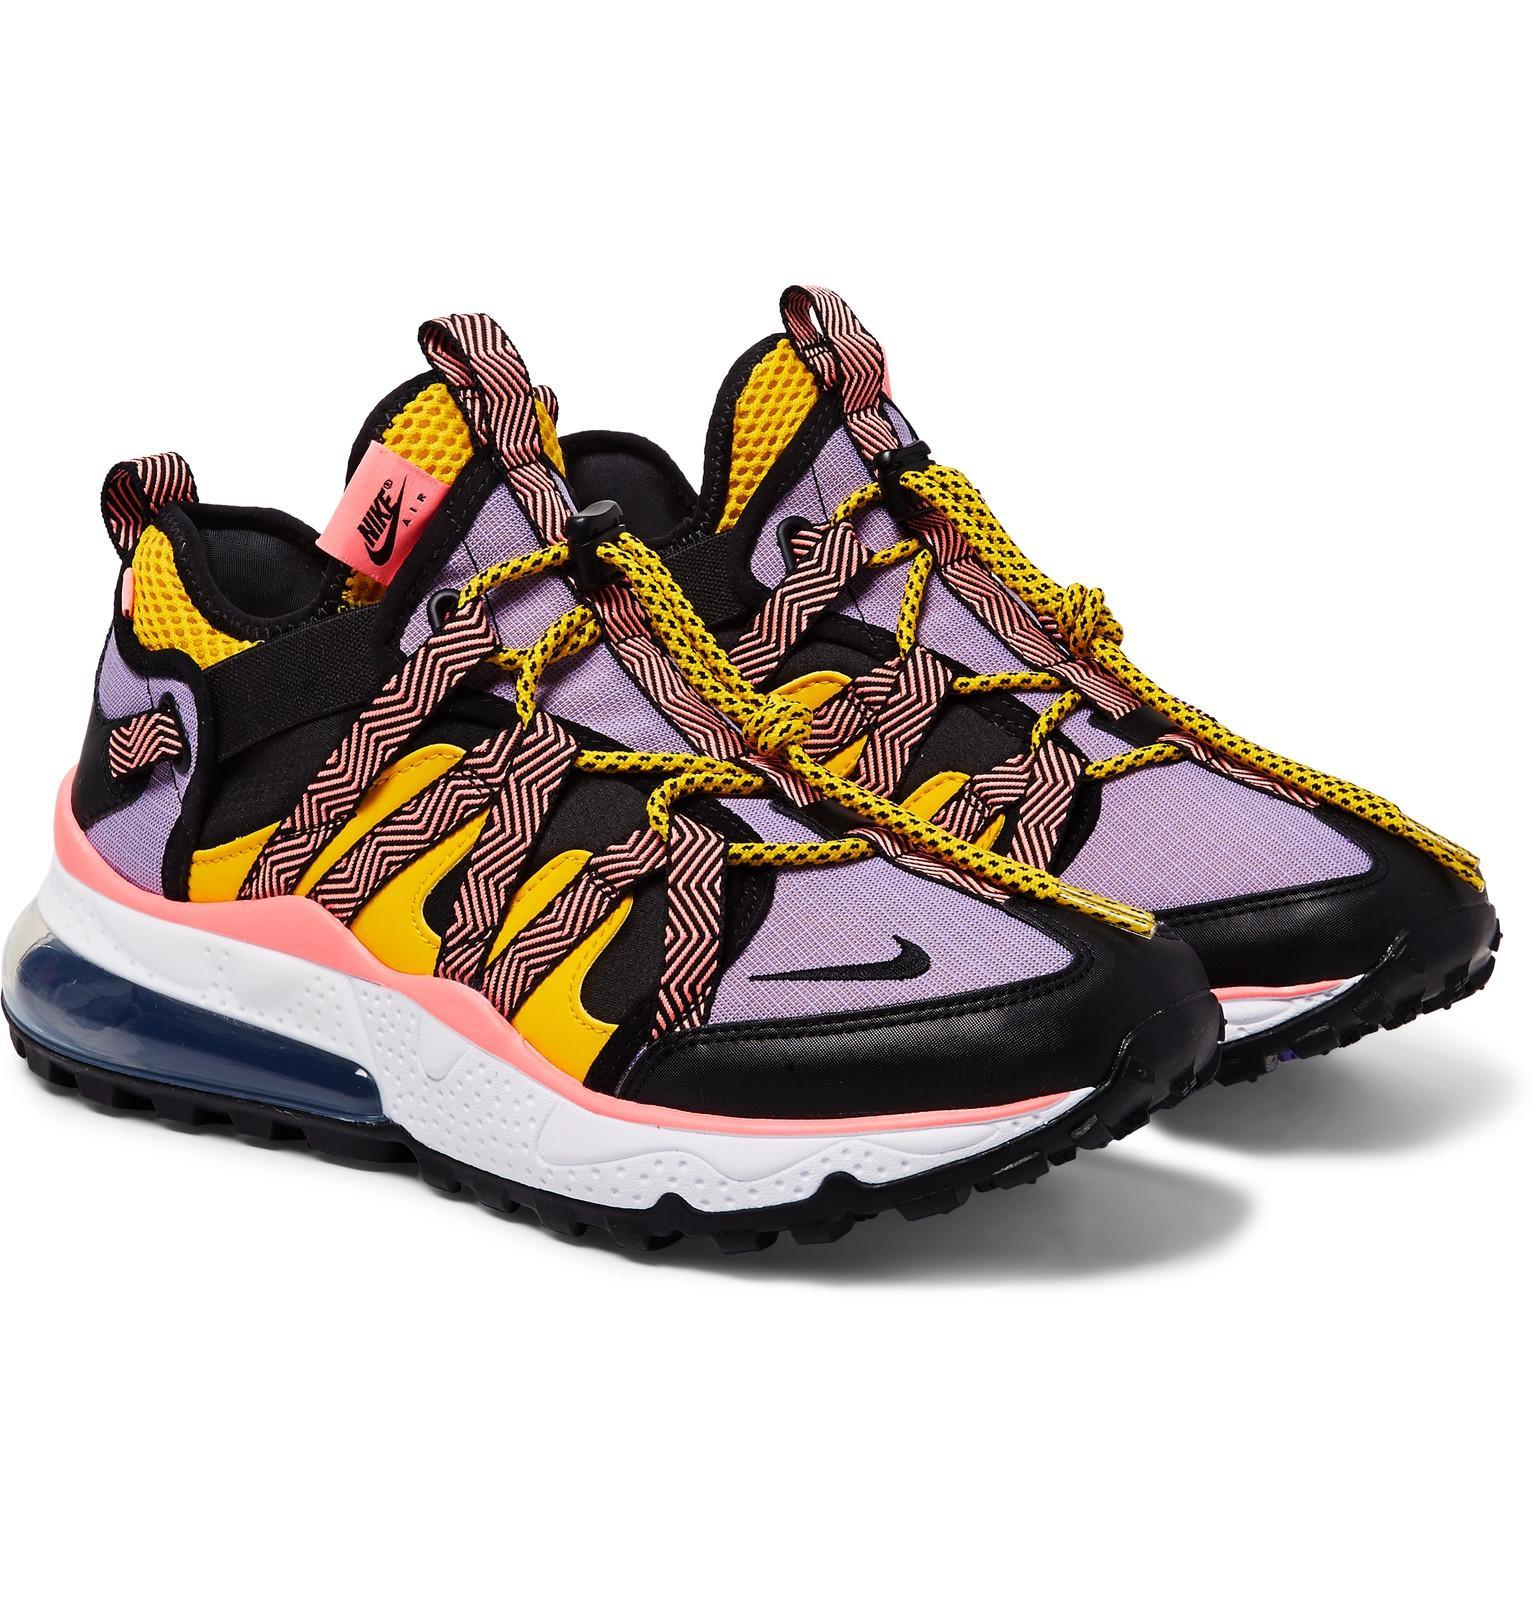 new arrival 7781c 38b5b Nike - Multicolor Air Max 270 Bowfin Mesh And Nylon Sneakers for Men - Lyst.  View fullscreen